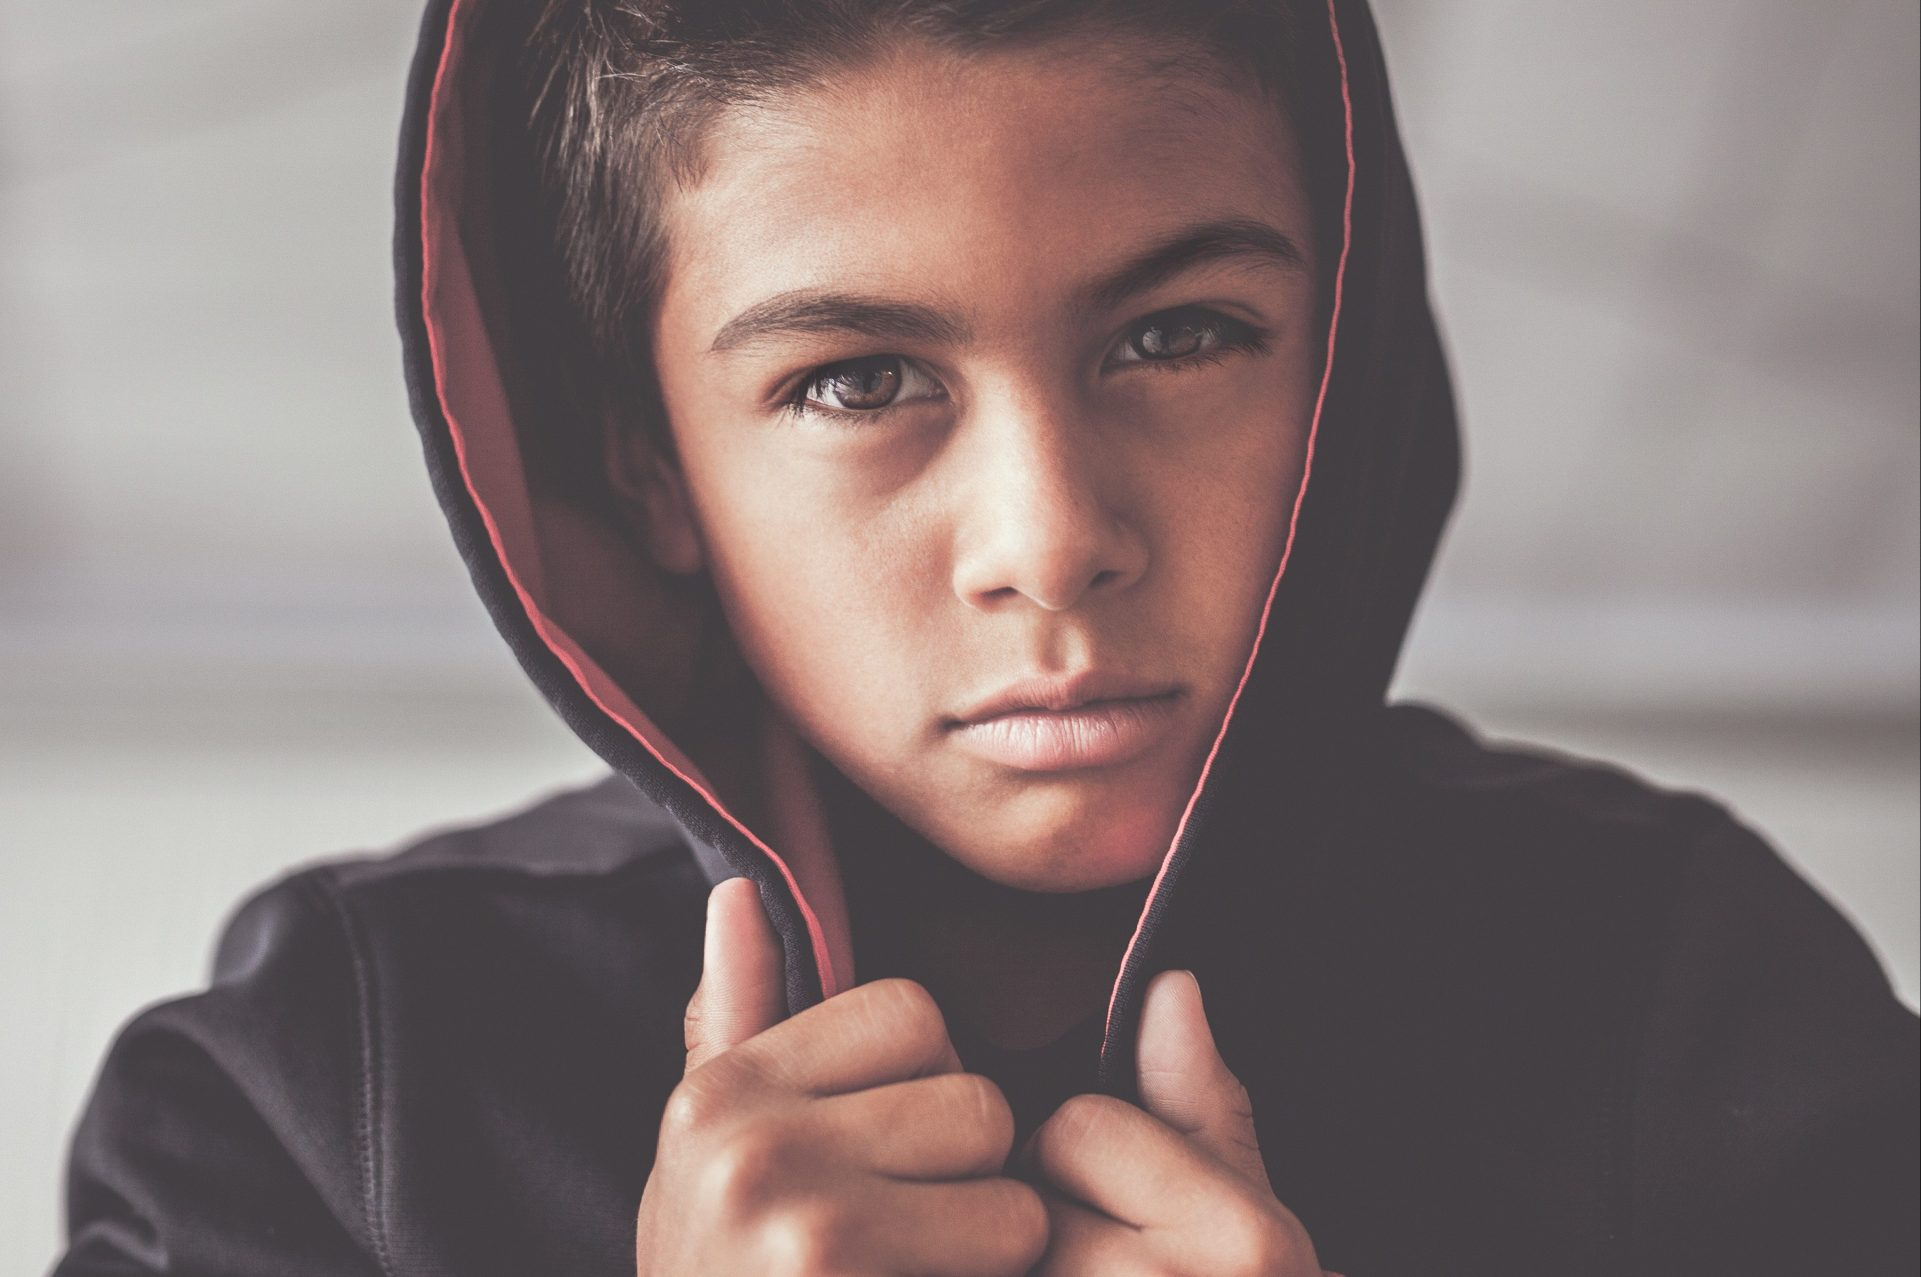 young teen boy